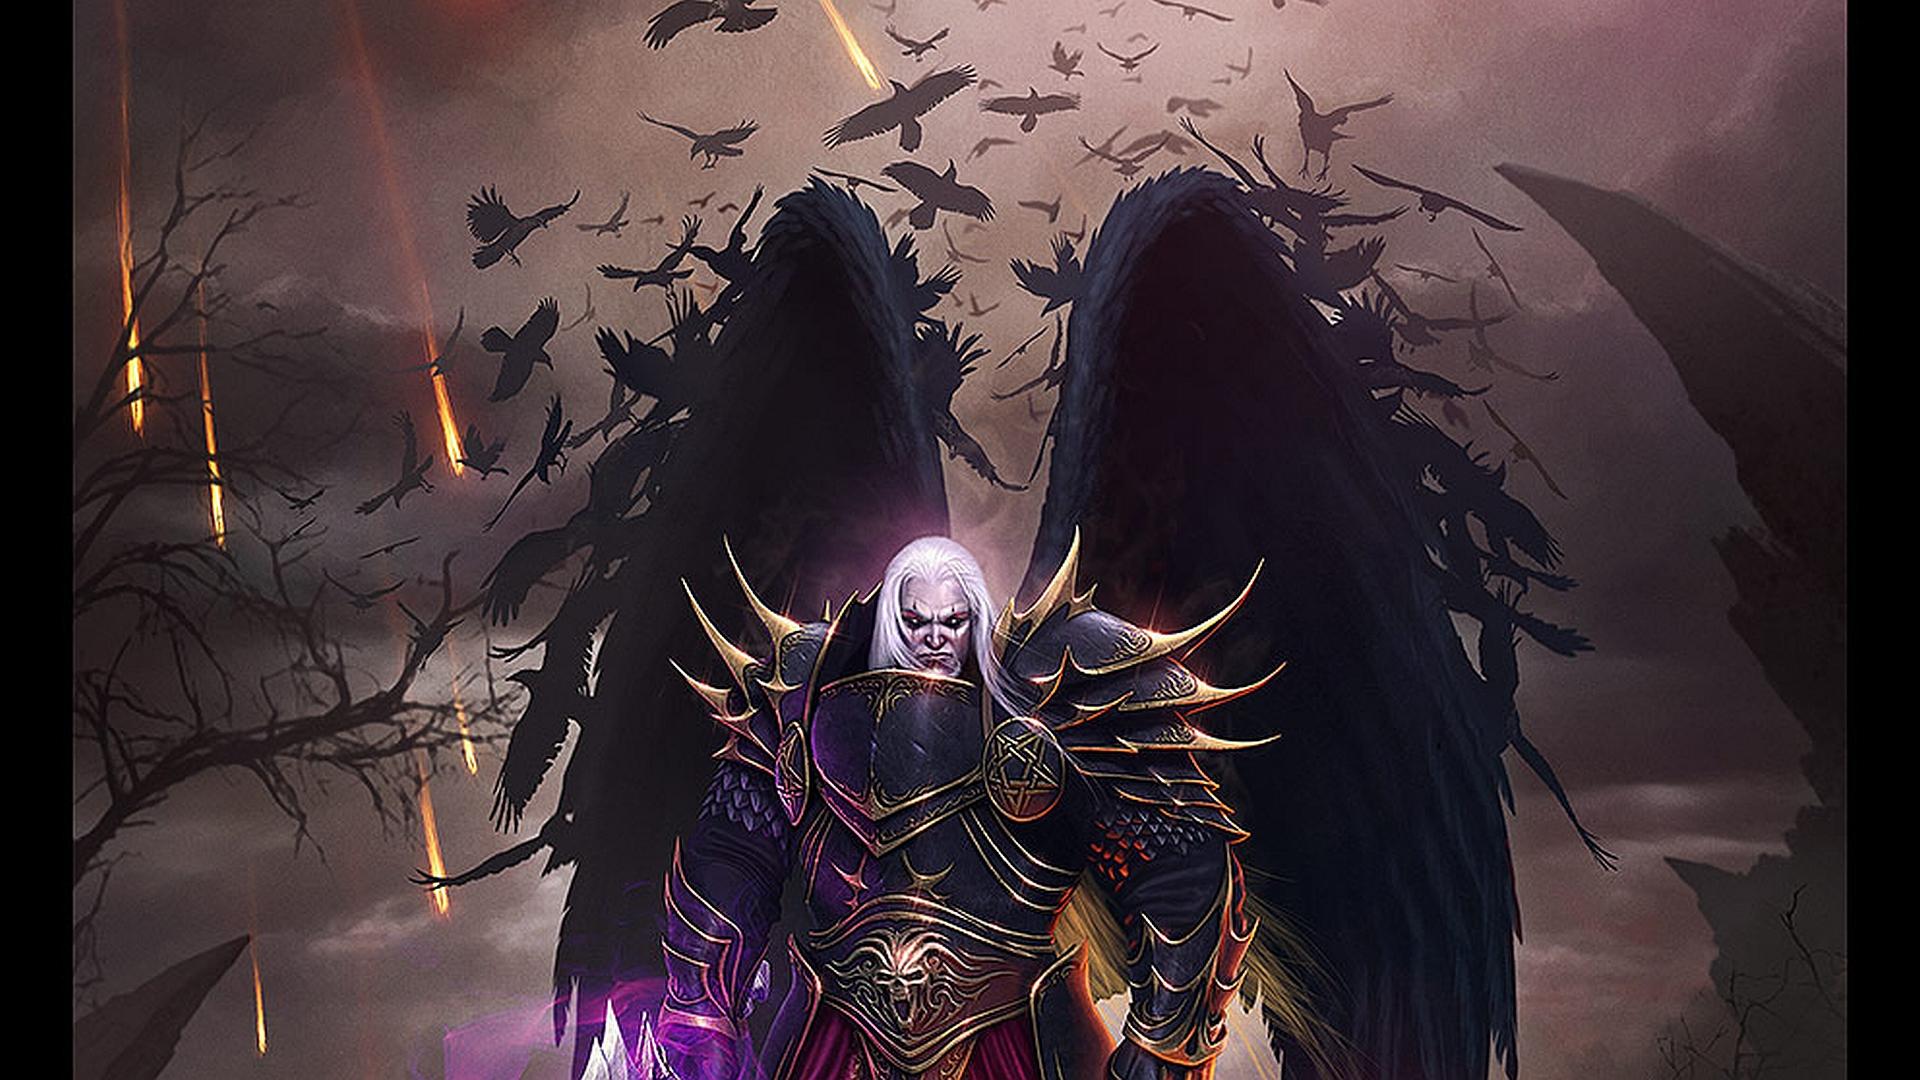 Angel hd wallpaper background image 1920x1080 id - Dark gothic angel wallpaper ...